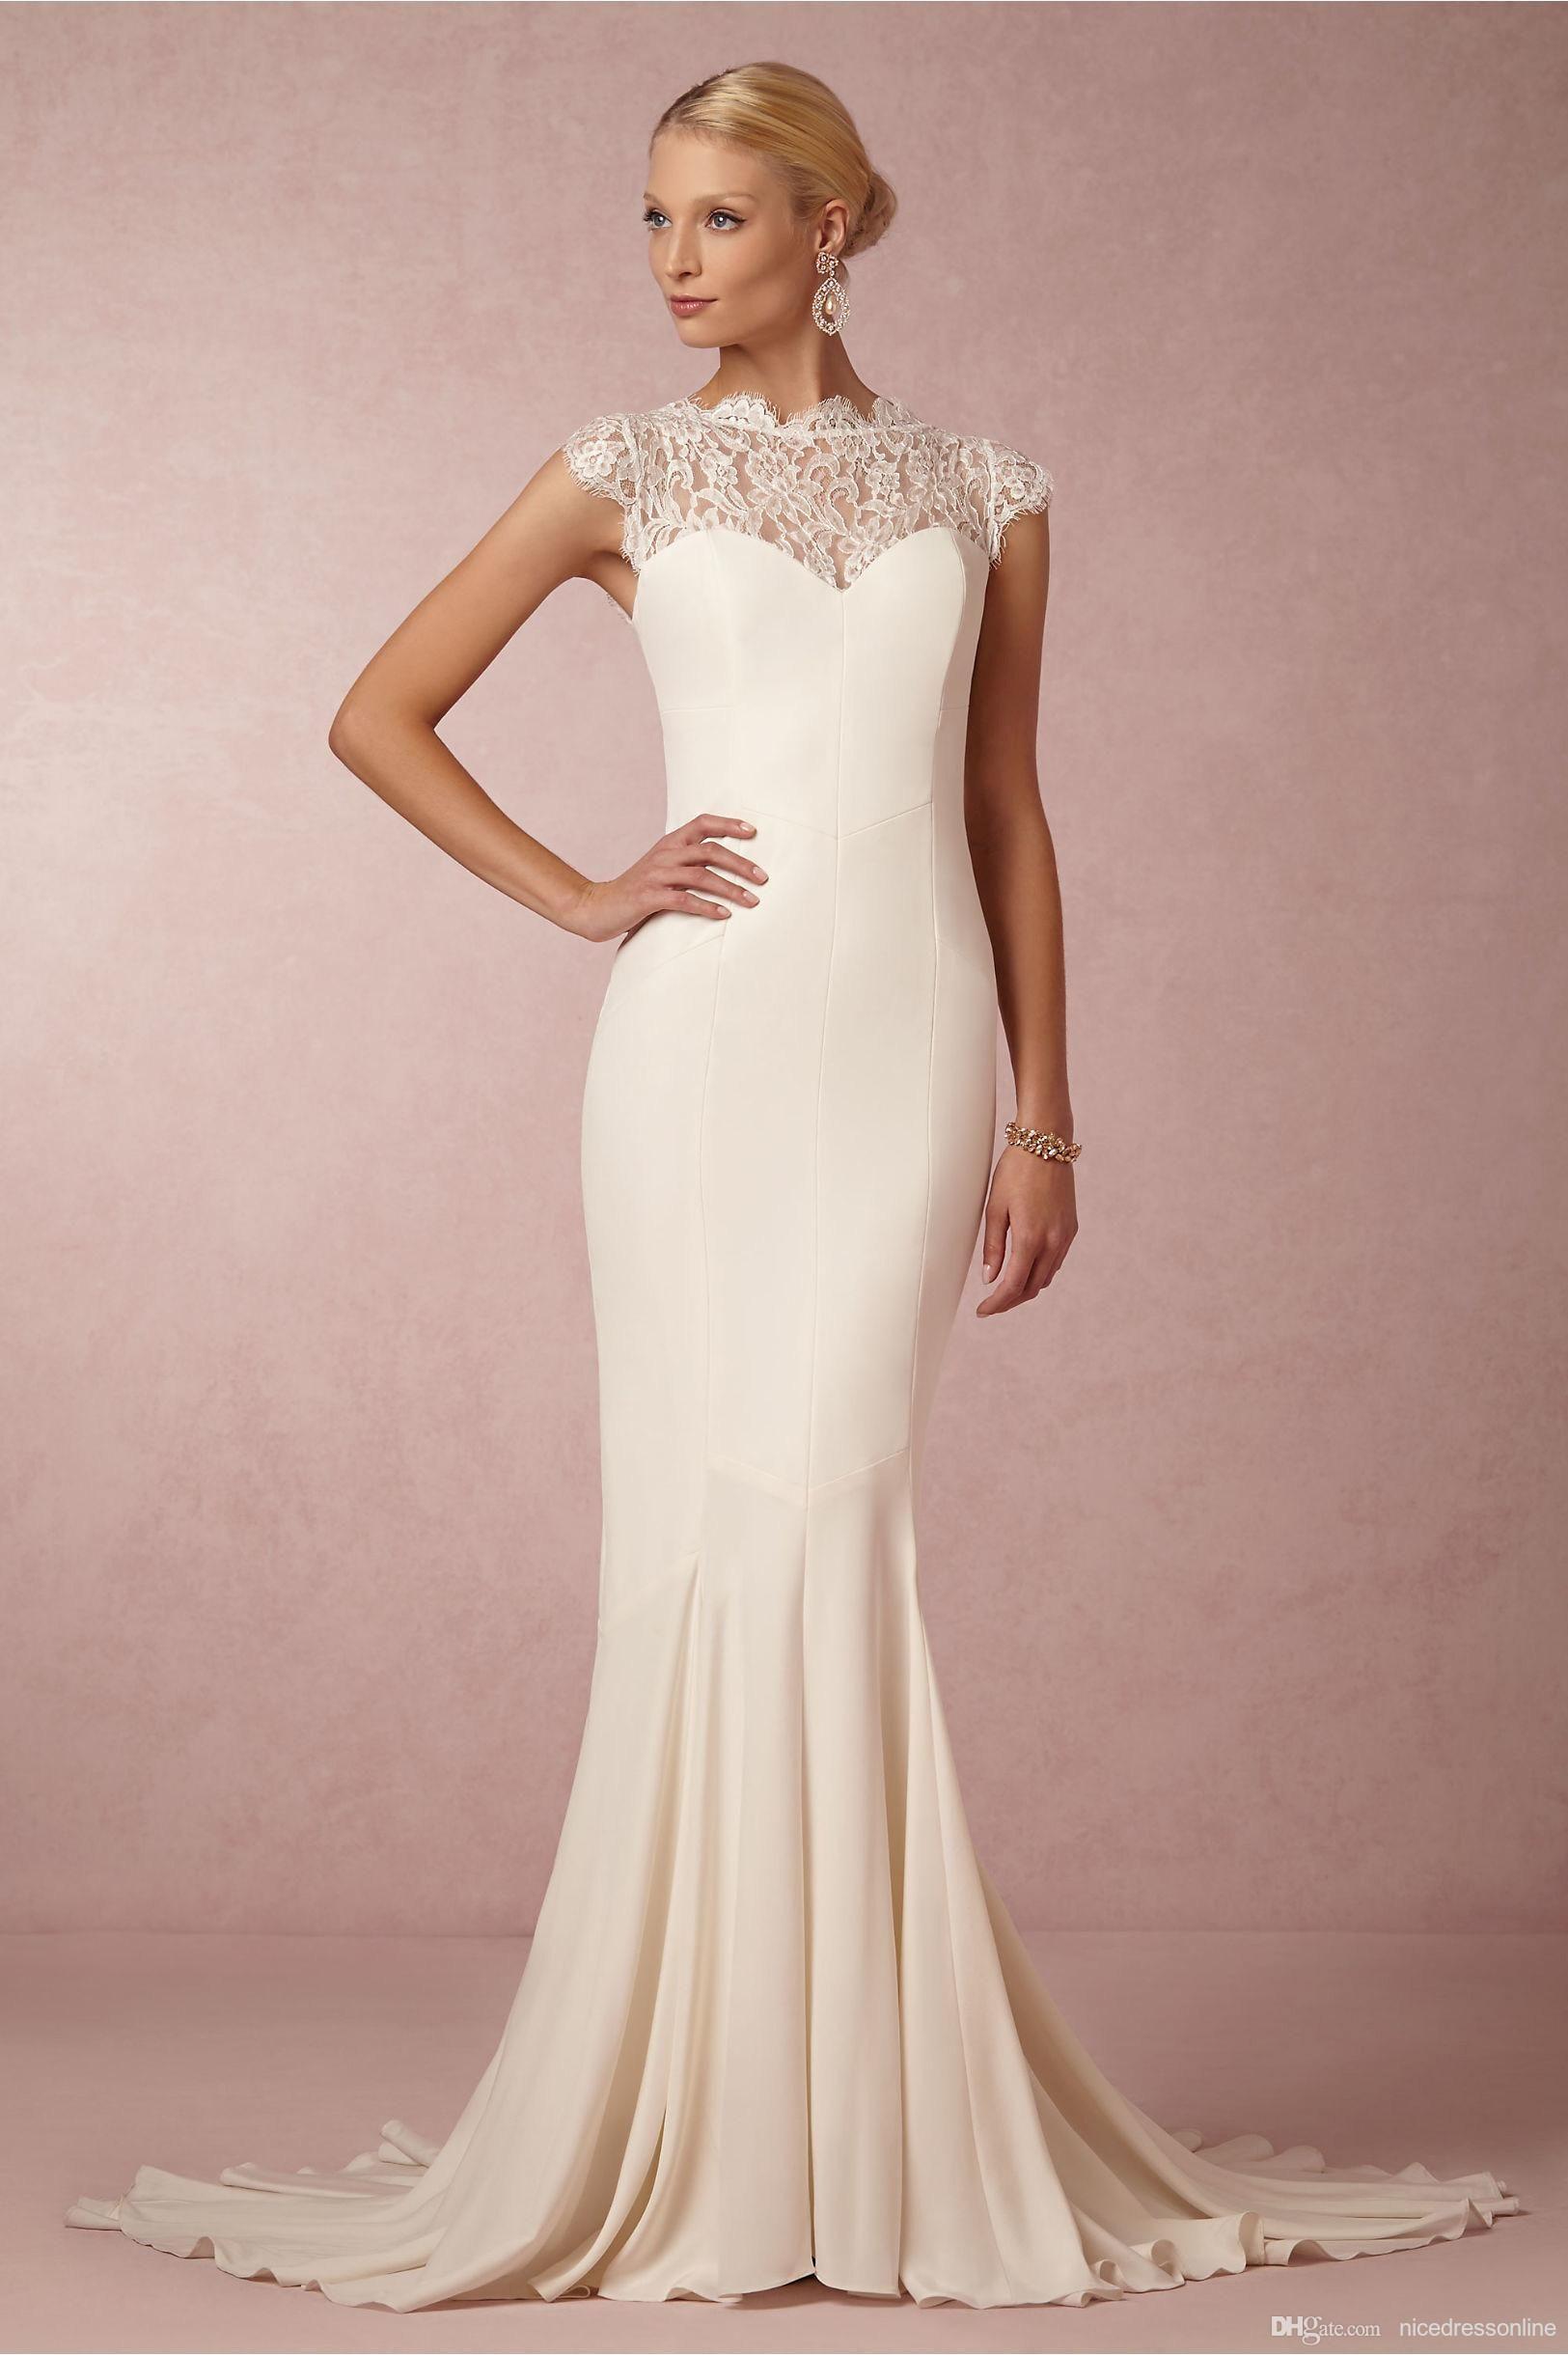 Bhldn 2016 Elegant Wedding Dresses with Cap Sleeves High Neck Lace ...